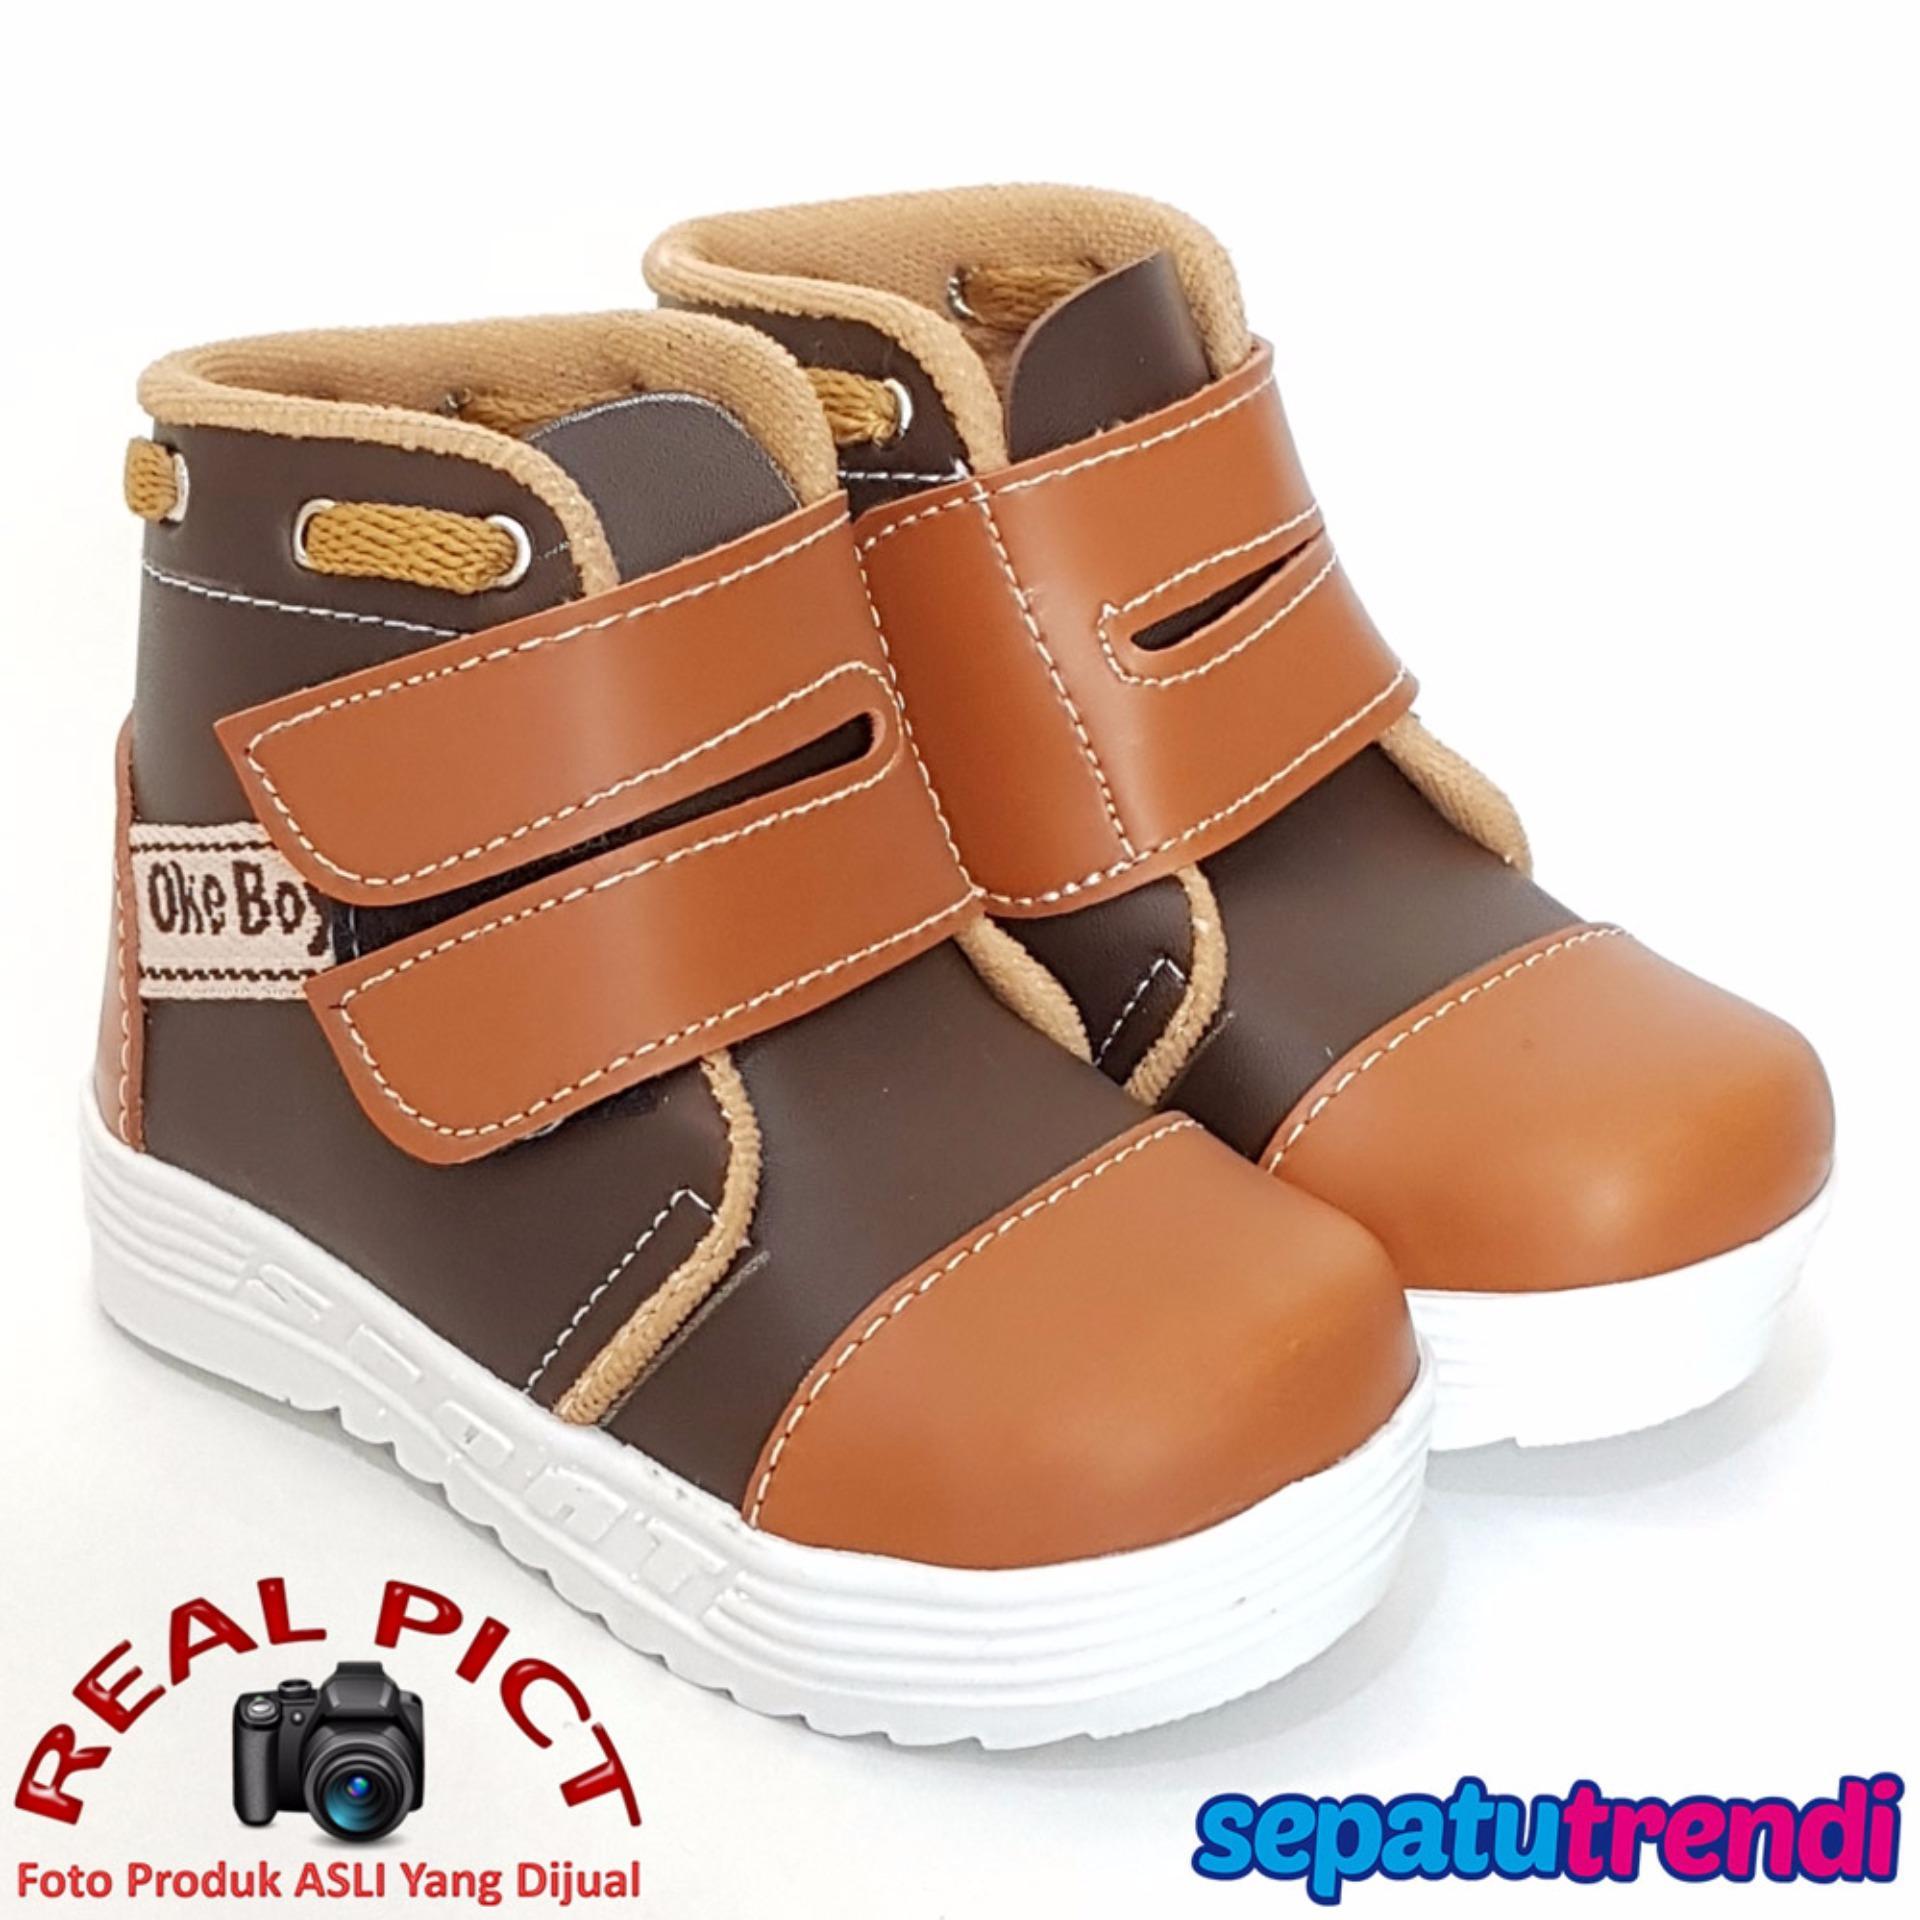 Jual Trendishoes Sepatu Boot Anak Laki Velvro Keren Okbsp Coklat Tan Trendishoes Original